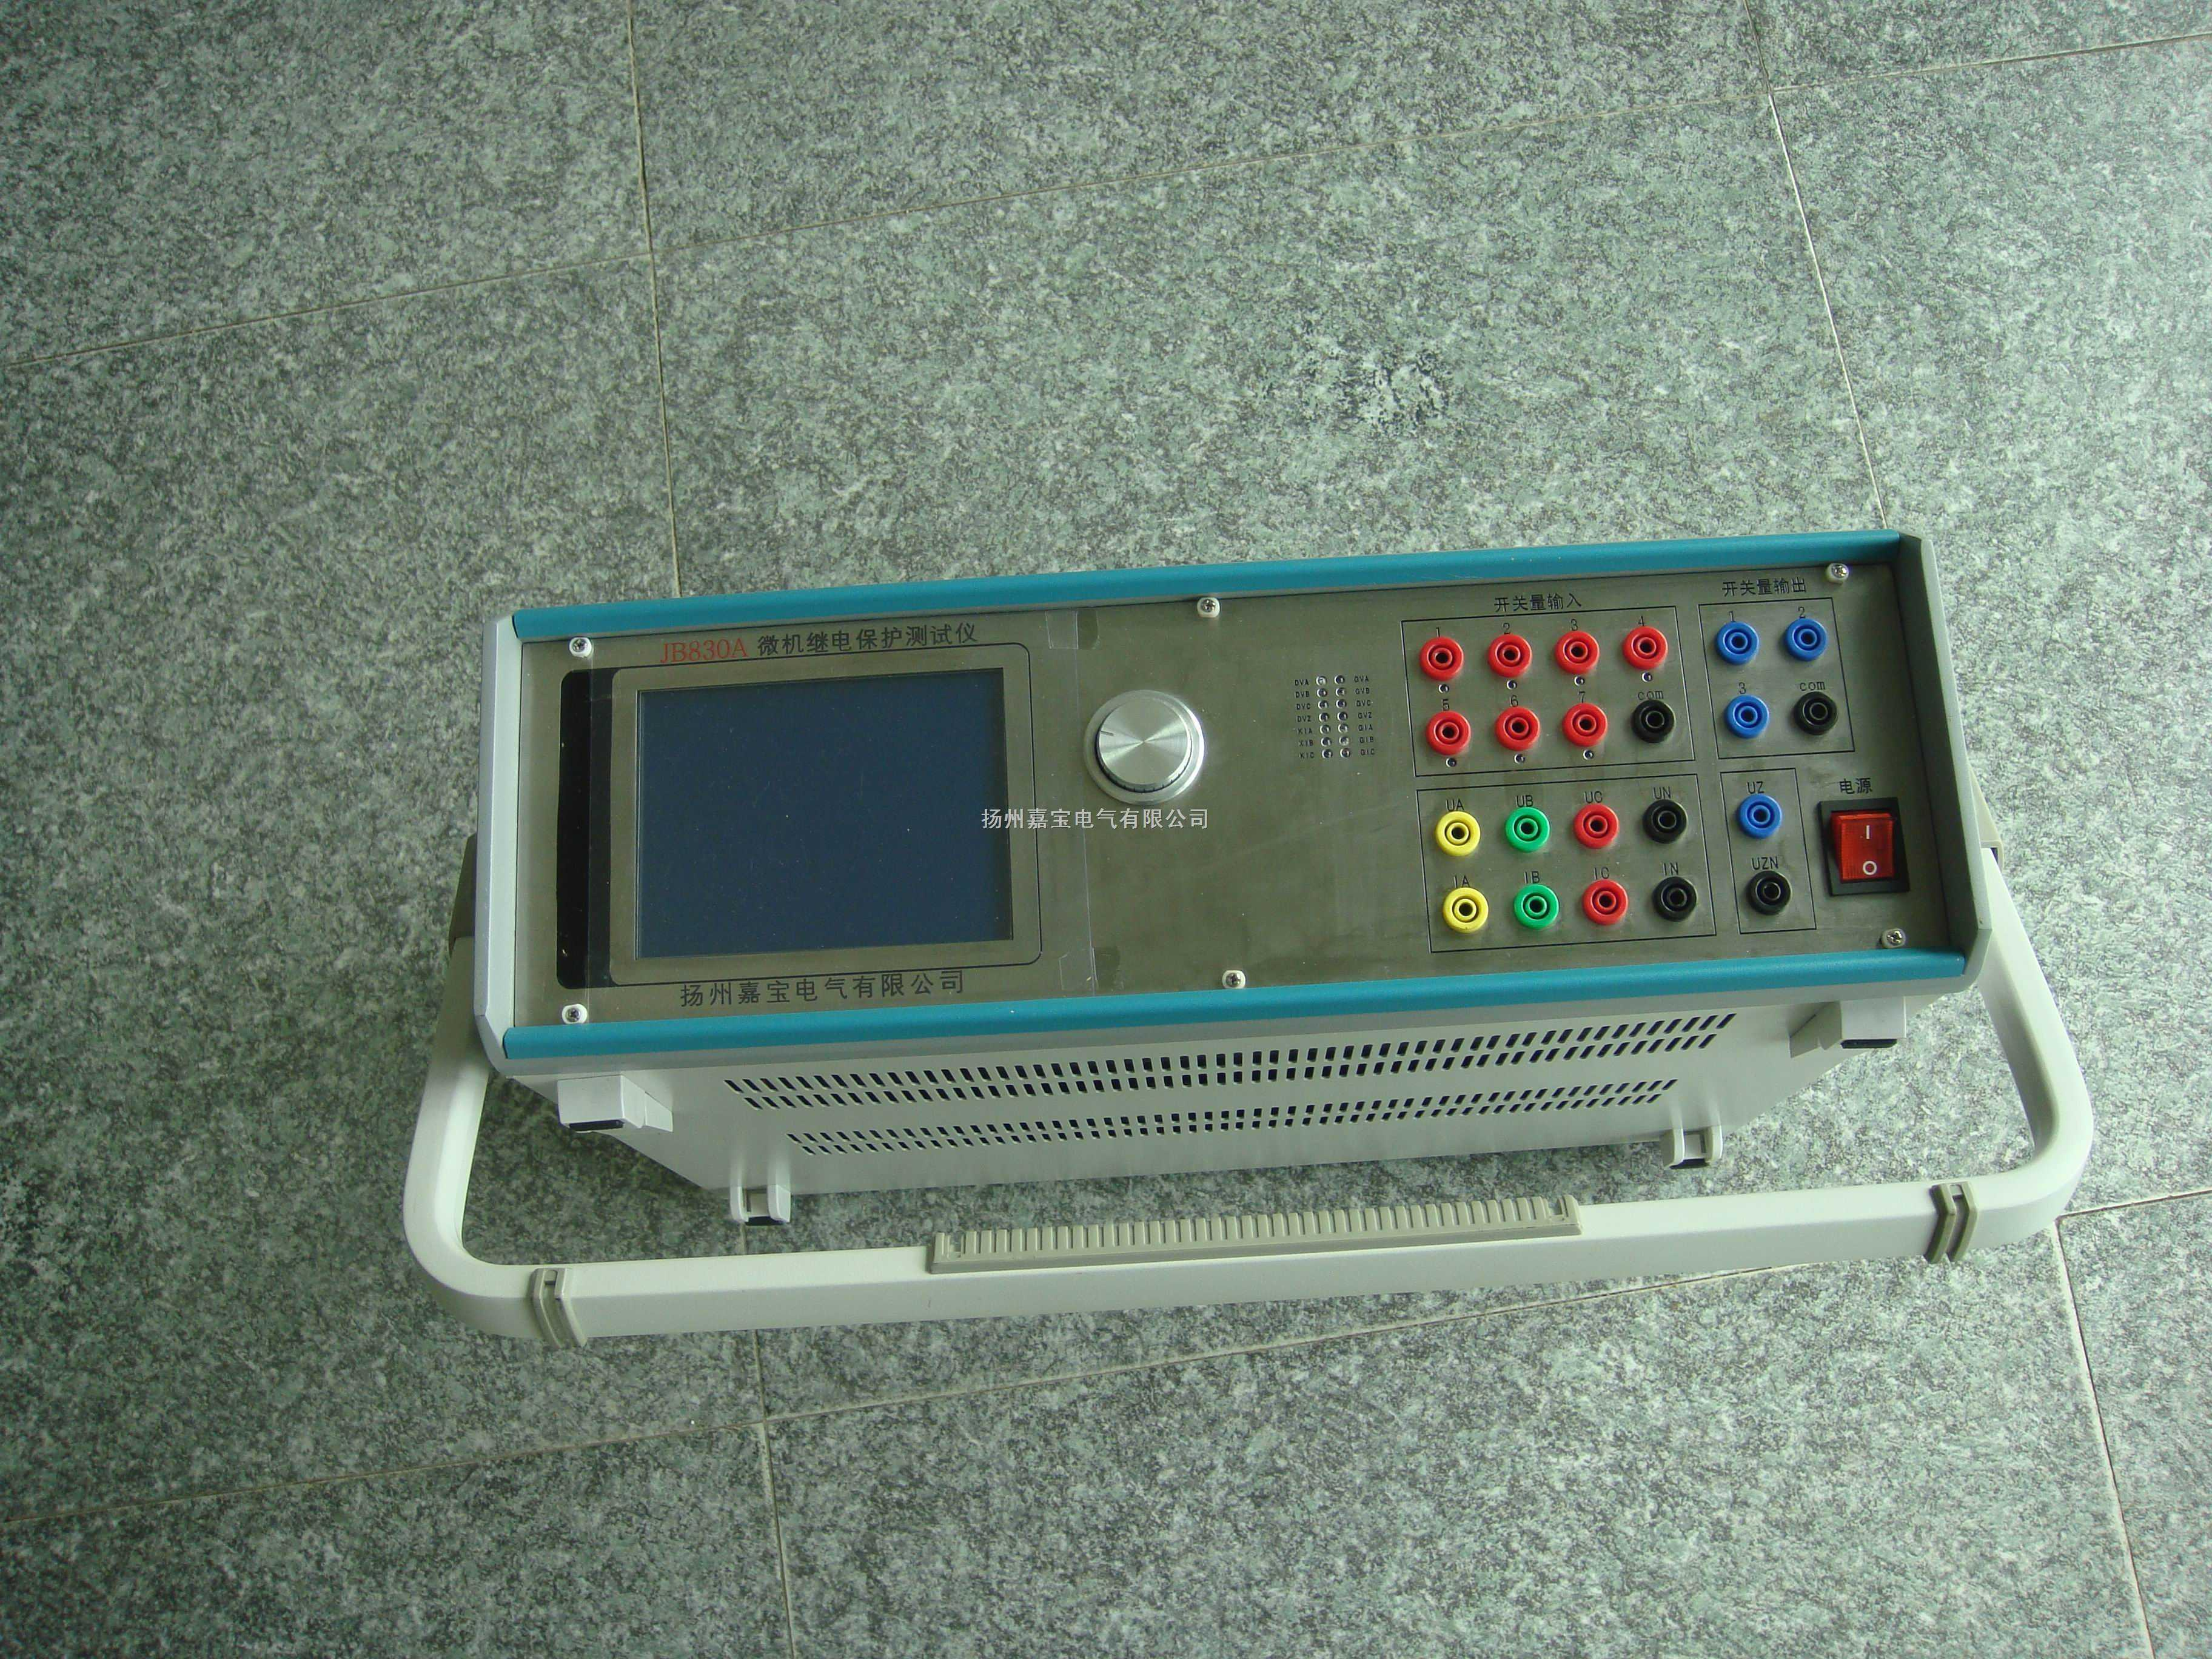 JB830A三相微机继电保护测试仪是在参照电力部颁发的《微机型继电保护试验装置技术条件(讨论稿)》的基础上,广泛听取用户意见,总结目前国内同类产品优缺点,充分使用现代先进的微电子技术和器件实现的一种新型小型化微机继电保护测试仪。三相微机继电保护测试仪它采用单机独立运行,亦可联接笔记本电脑运行的先进结构。主机内置新一代高速数字信号处理器微机、真16位DAC模块、新型模块式高保真大功率功放,自带大屏幕液晶显示器以及灵活方便的旋转鼠标控制器。单机独立操作即已具有很强的功能,可进行大多数试验,联接电脑运行则具有更